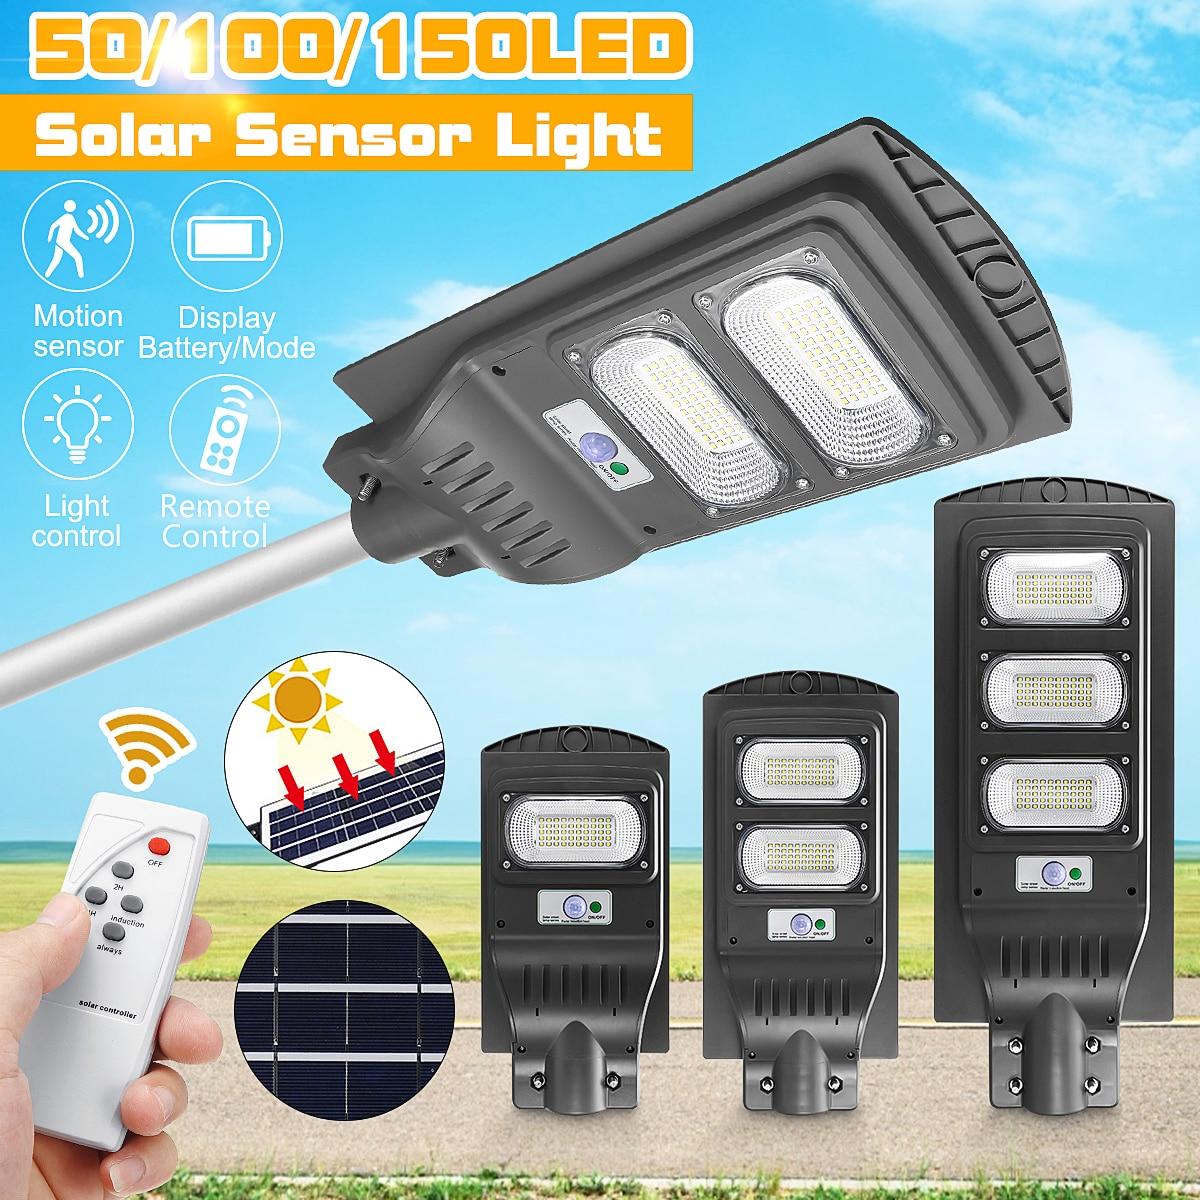 30/60/90W 150LED Wall Lamp IP65 Solar Street Light Radar motion 2 In 1 Constantly bright & Induction Solar Sensor Remote Control